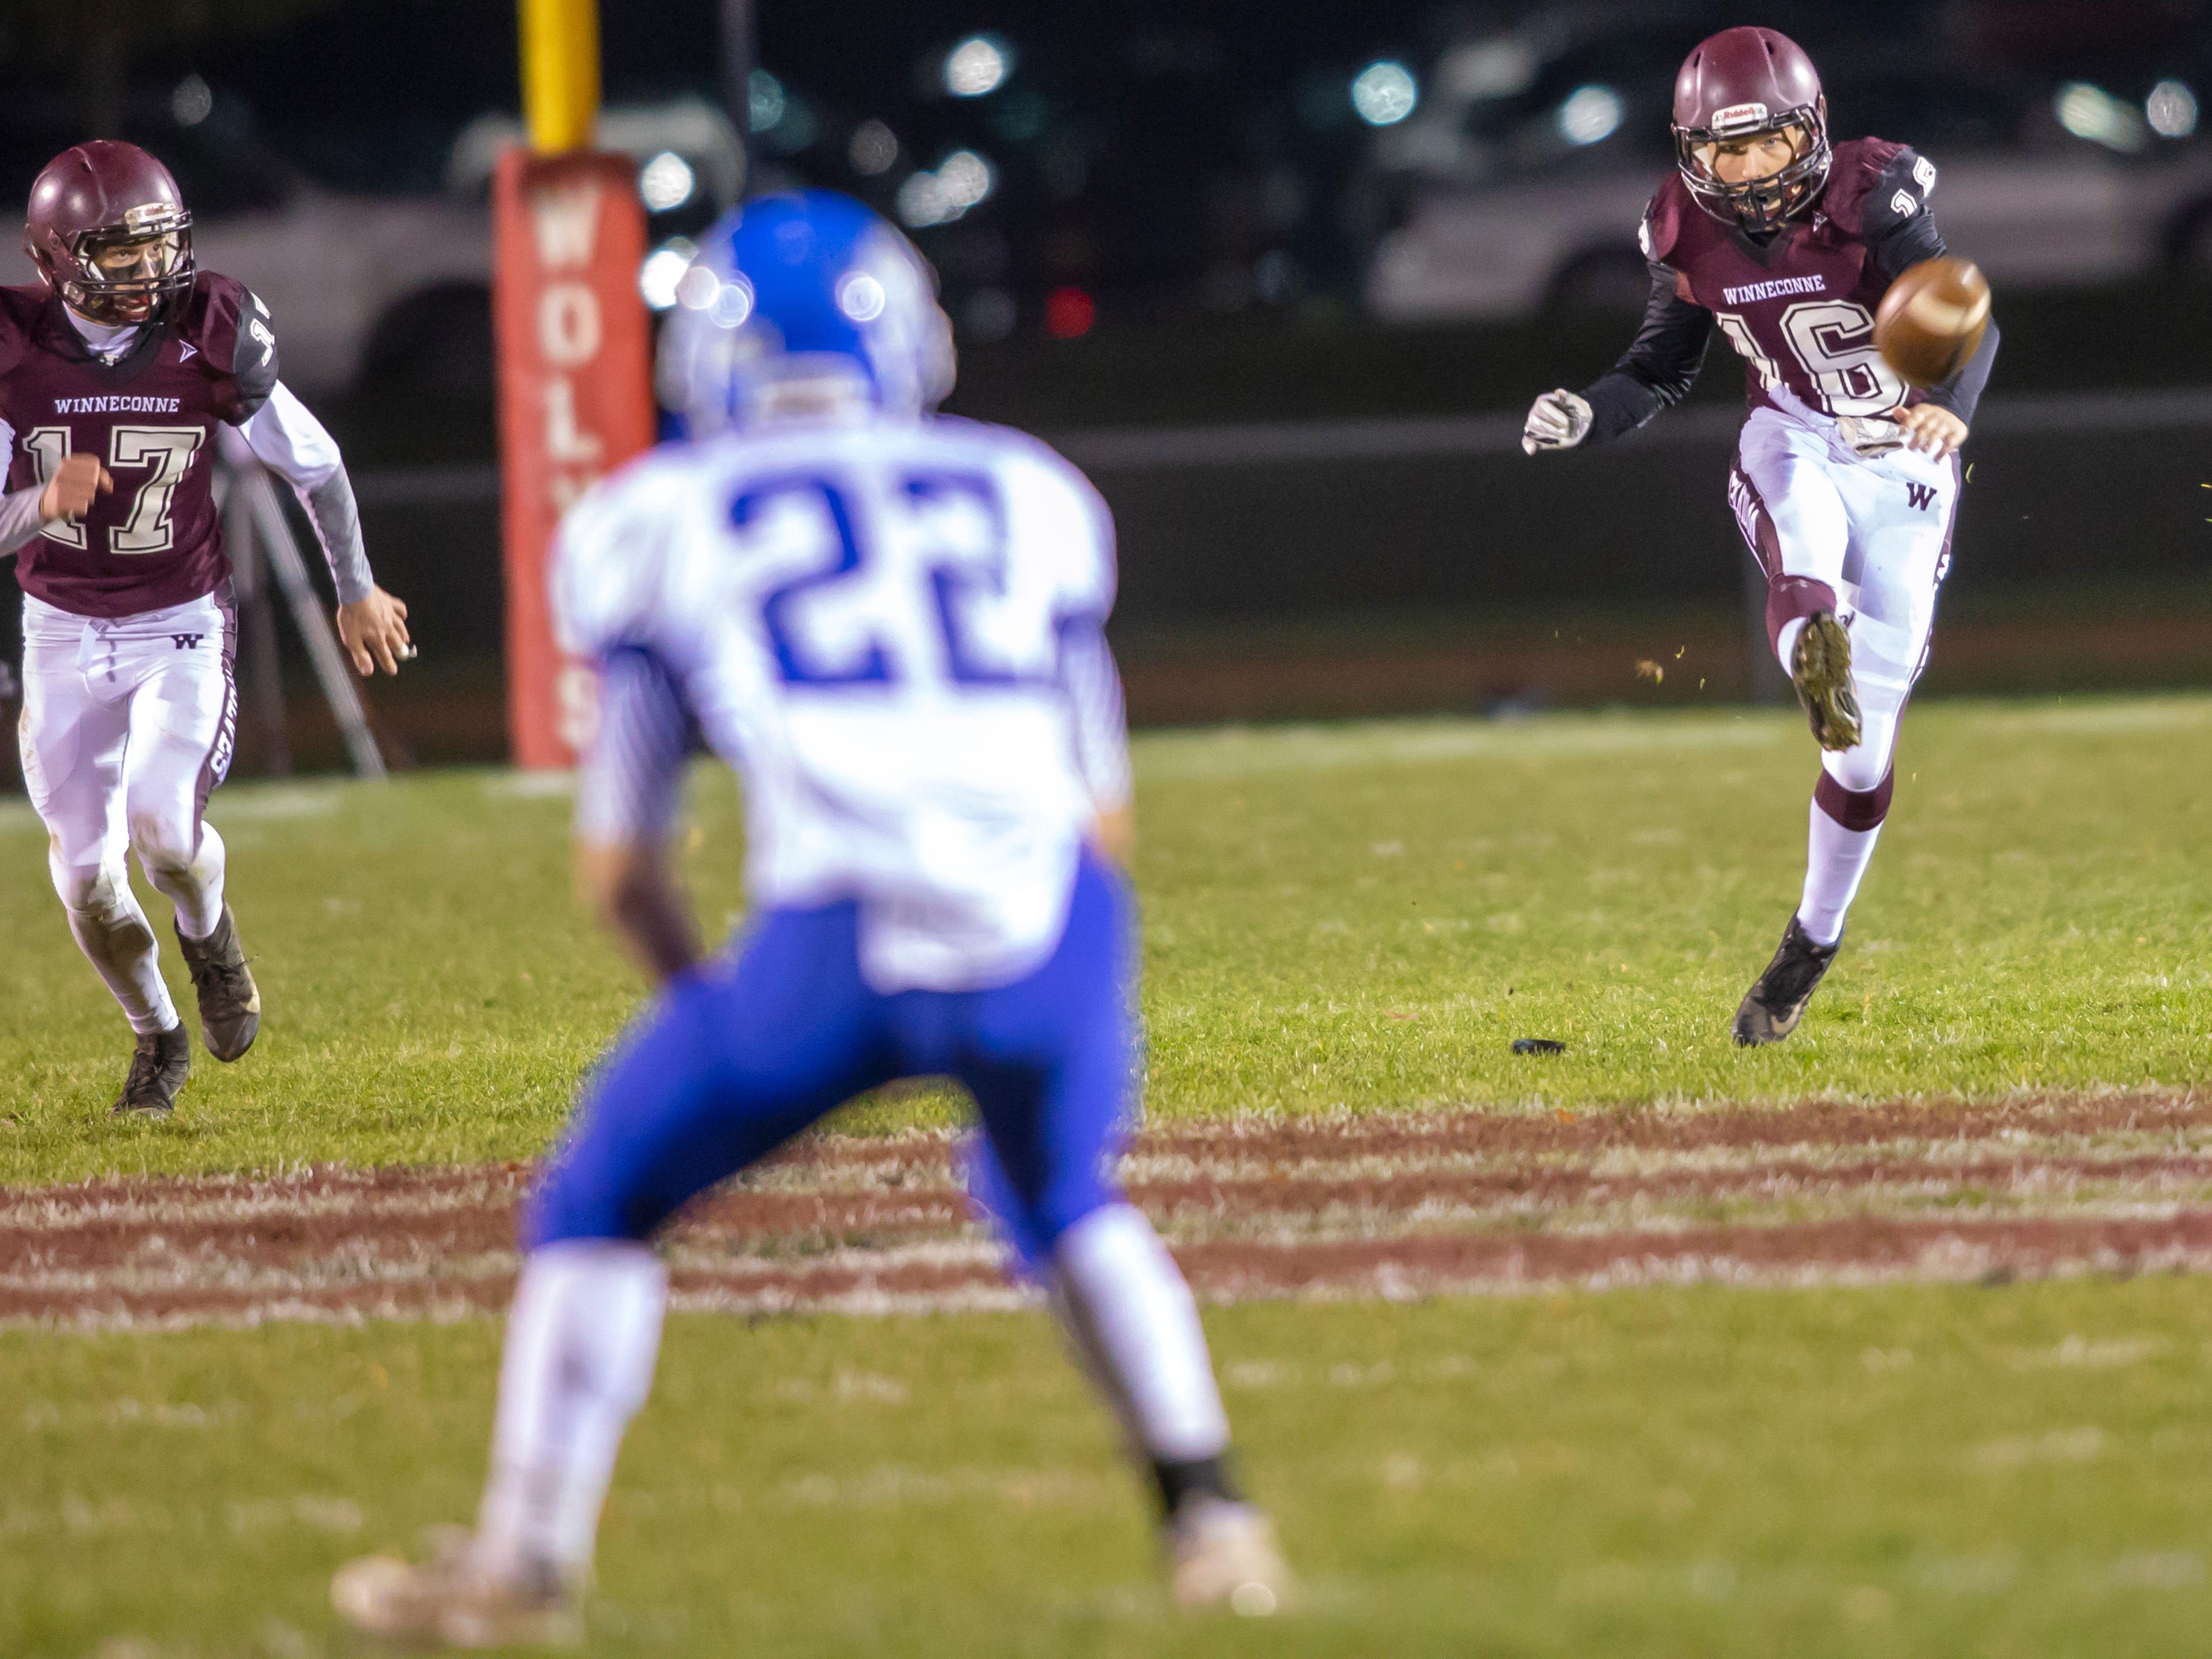 Winneconne's Evan Miller kicks off to Wrightstown at Winneconne High School on Friday, October 26, 2018.